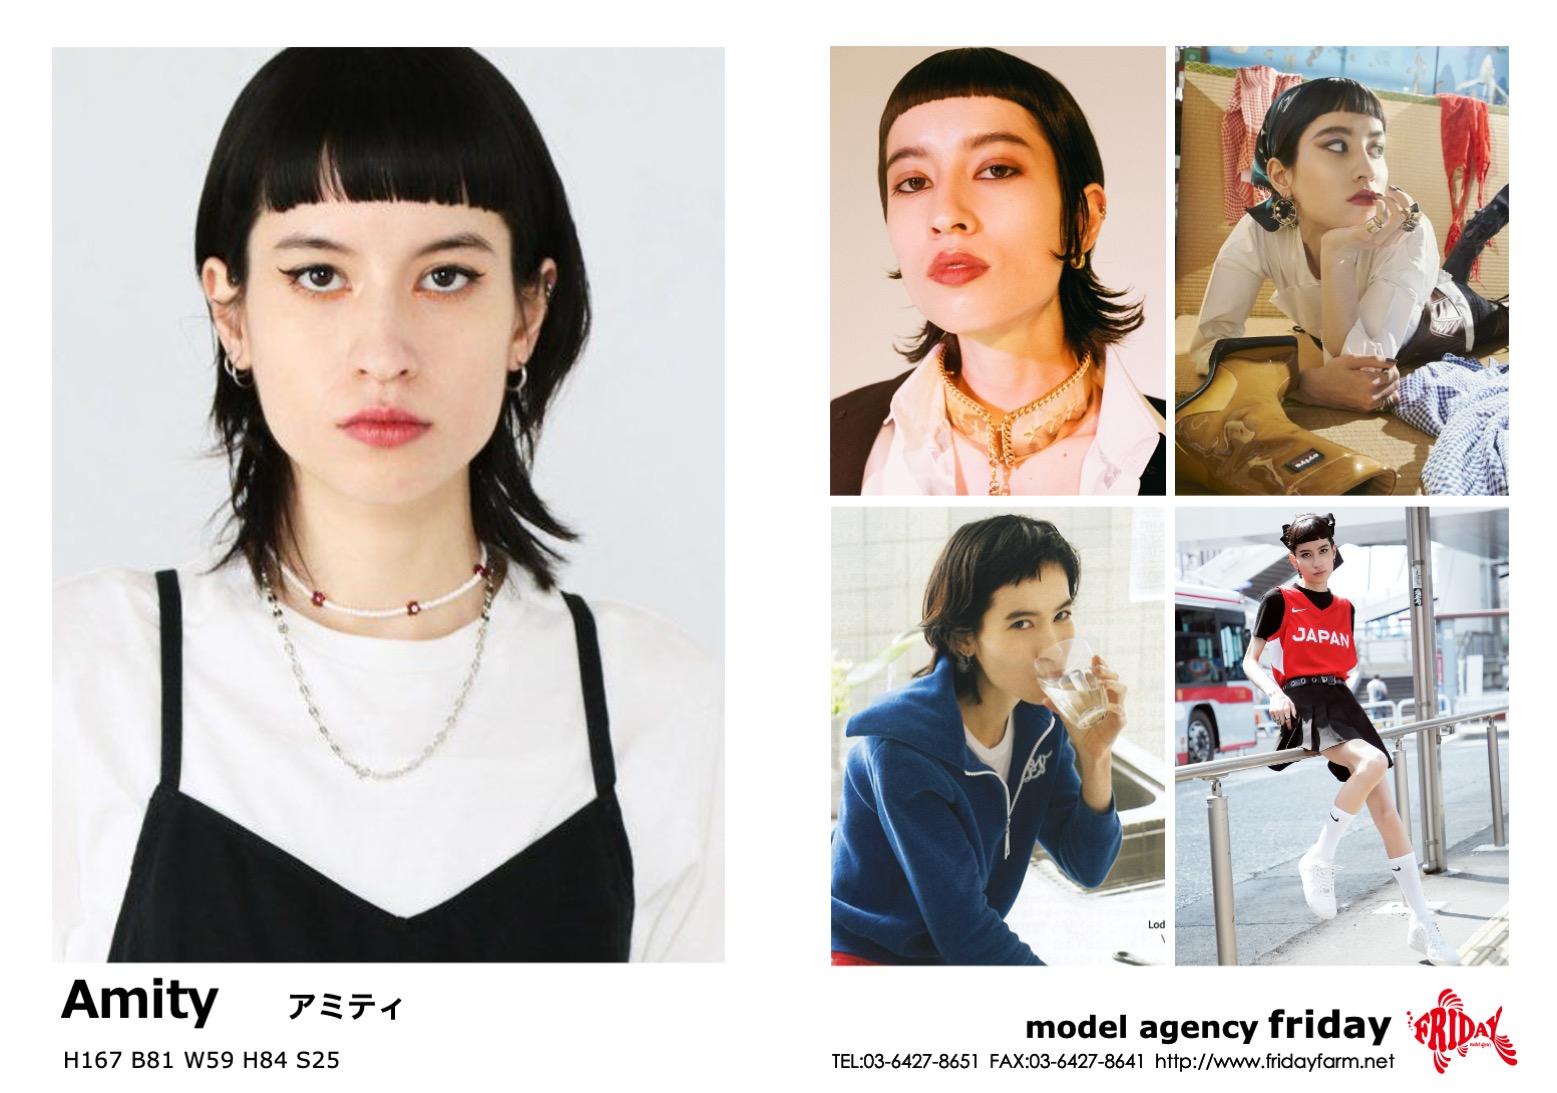 Amity - アミティー | model agency friday